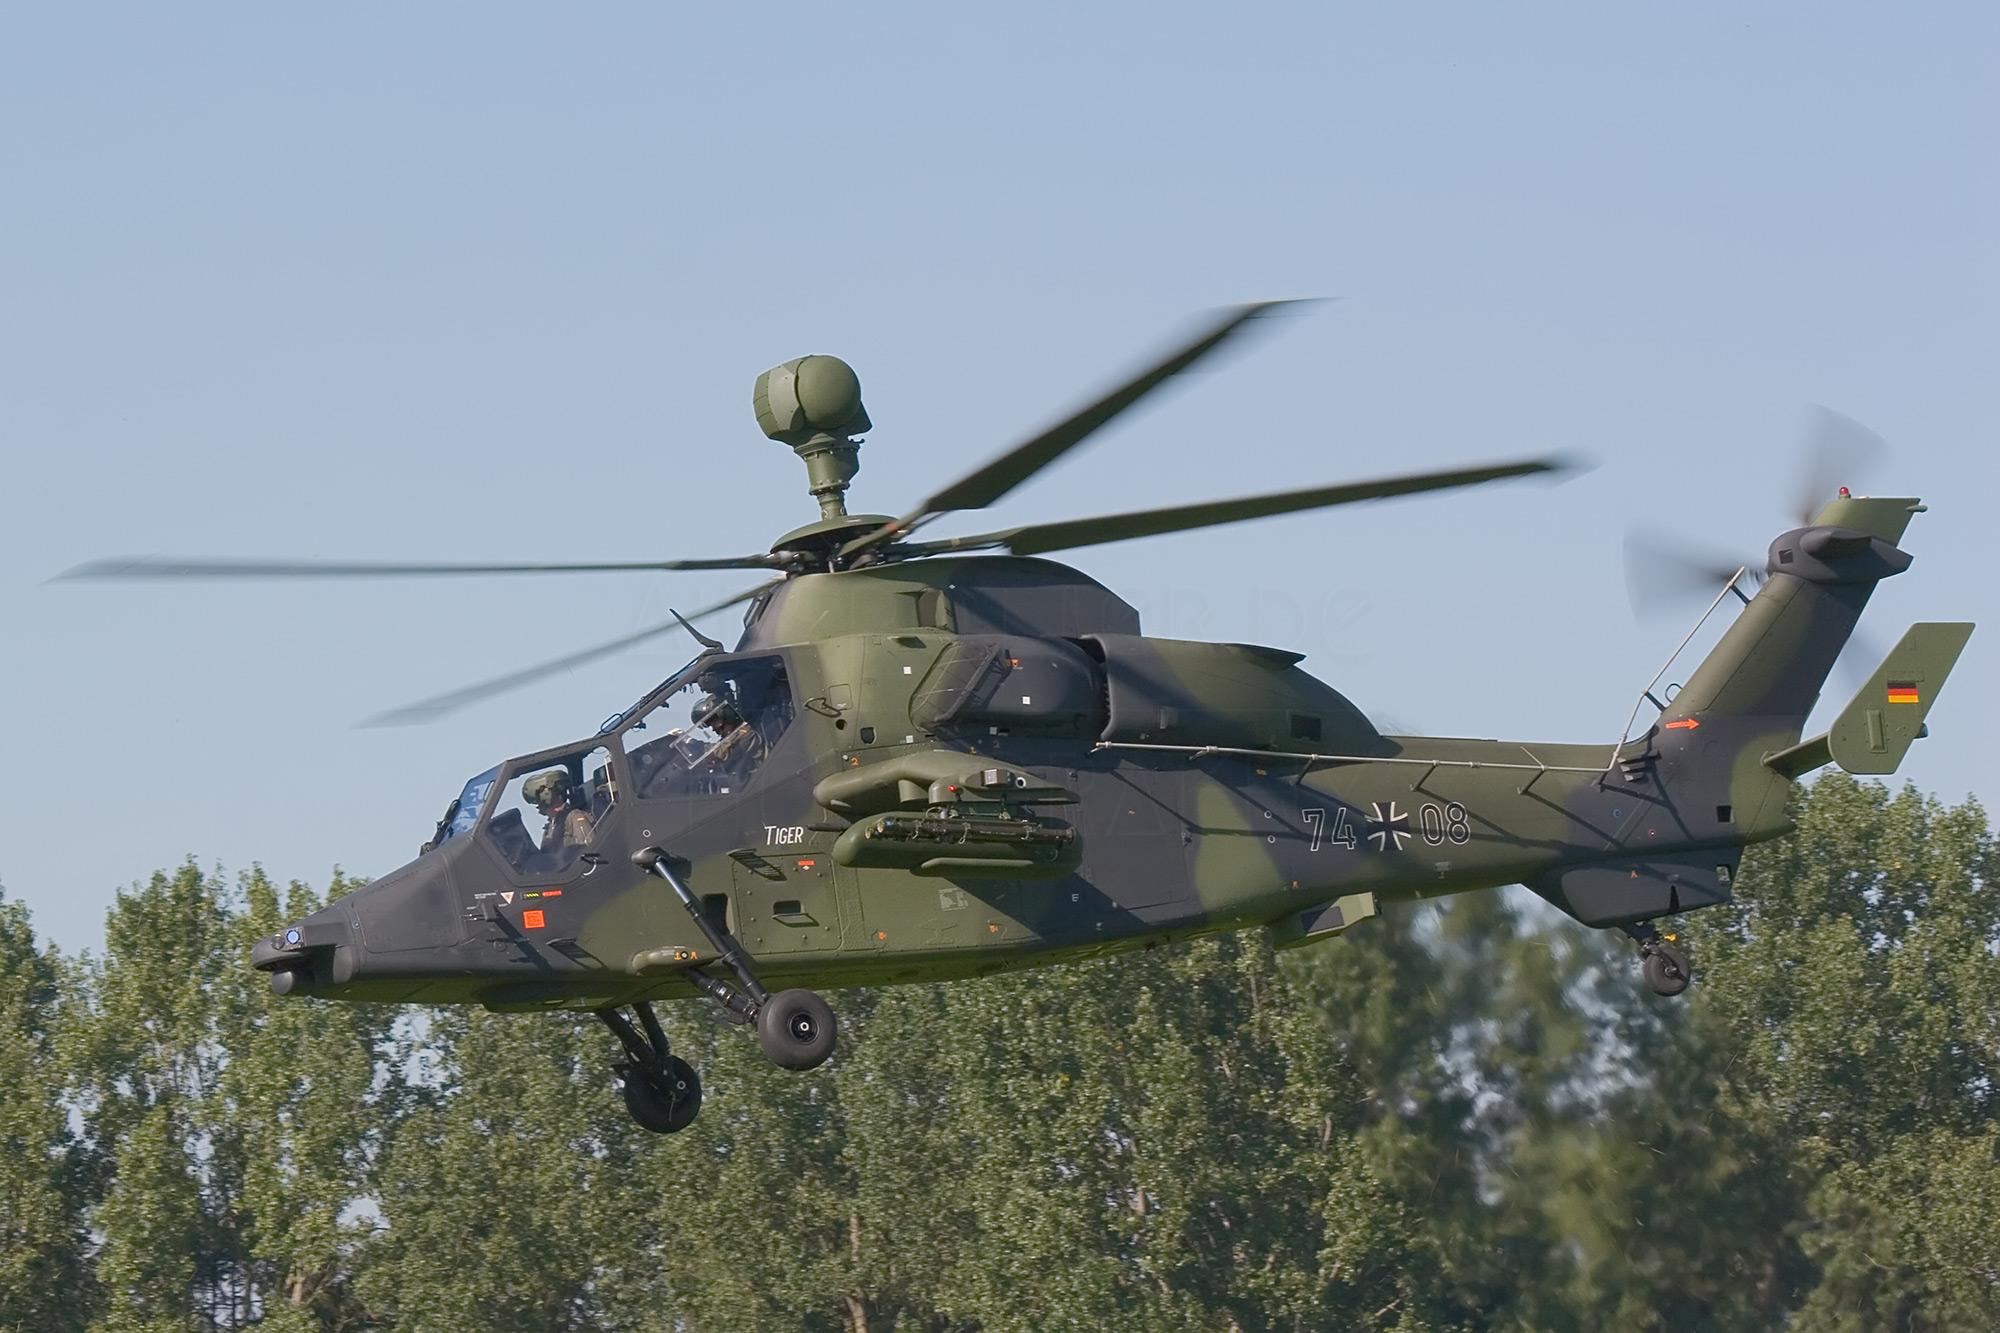 Airspotter.de 2006 Tag der Heeresflieger Eurocopter EC 665 UH Tiger